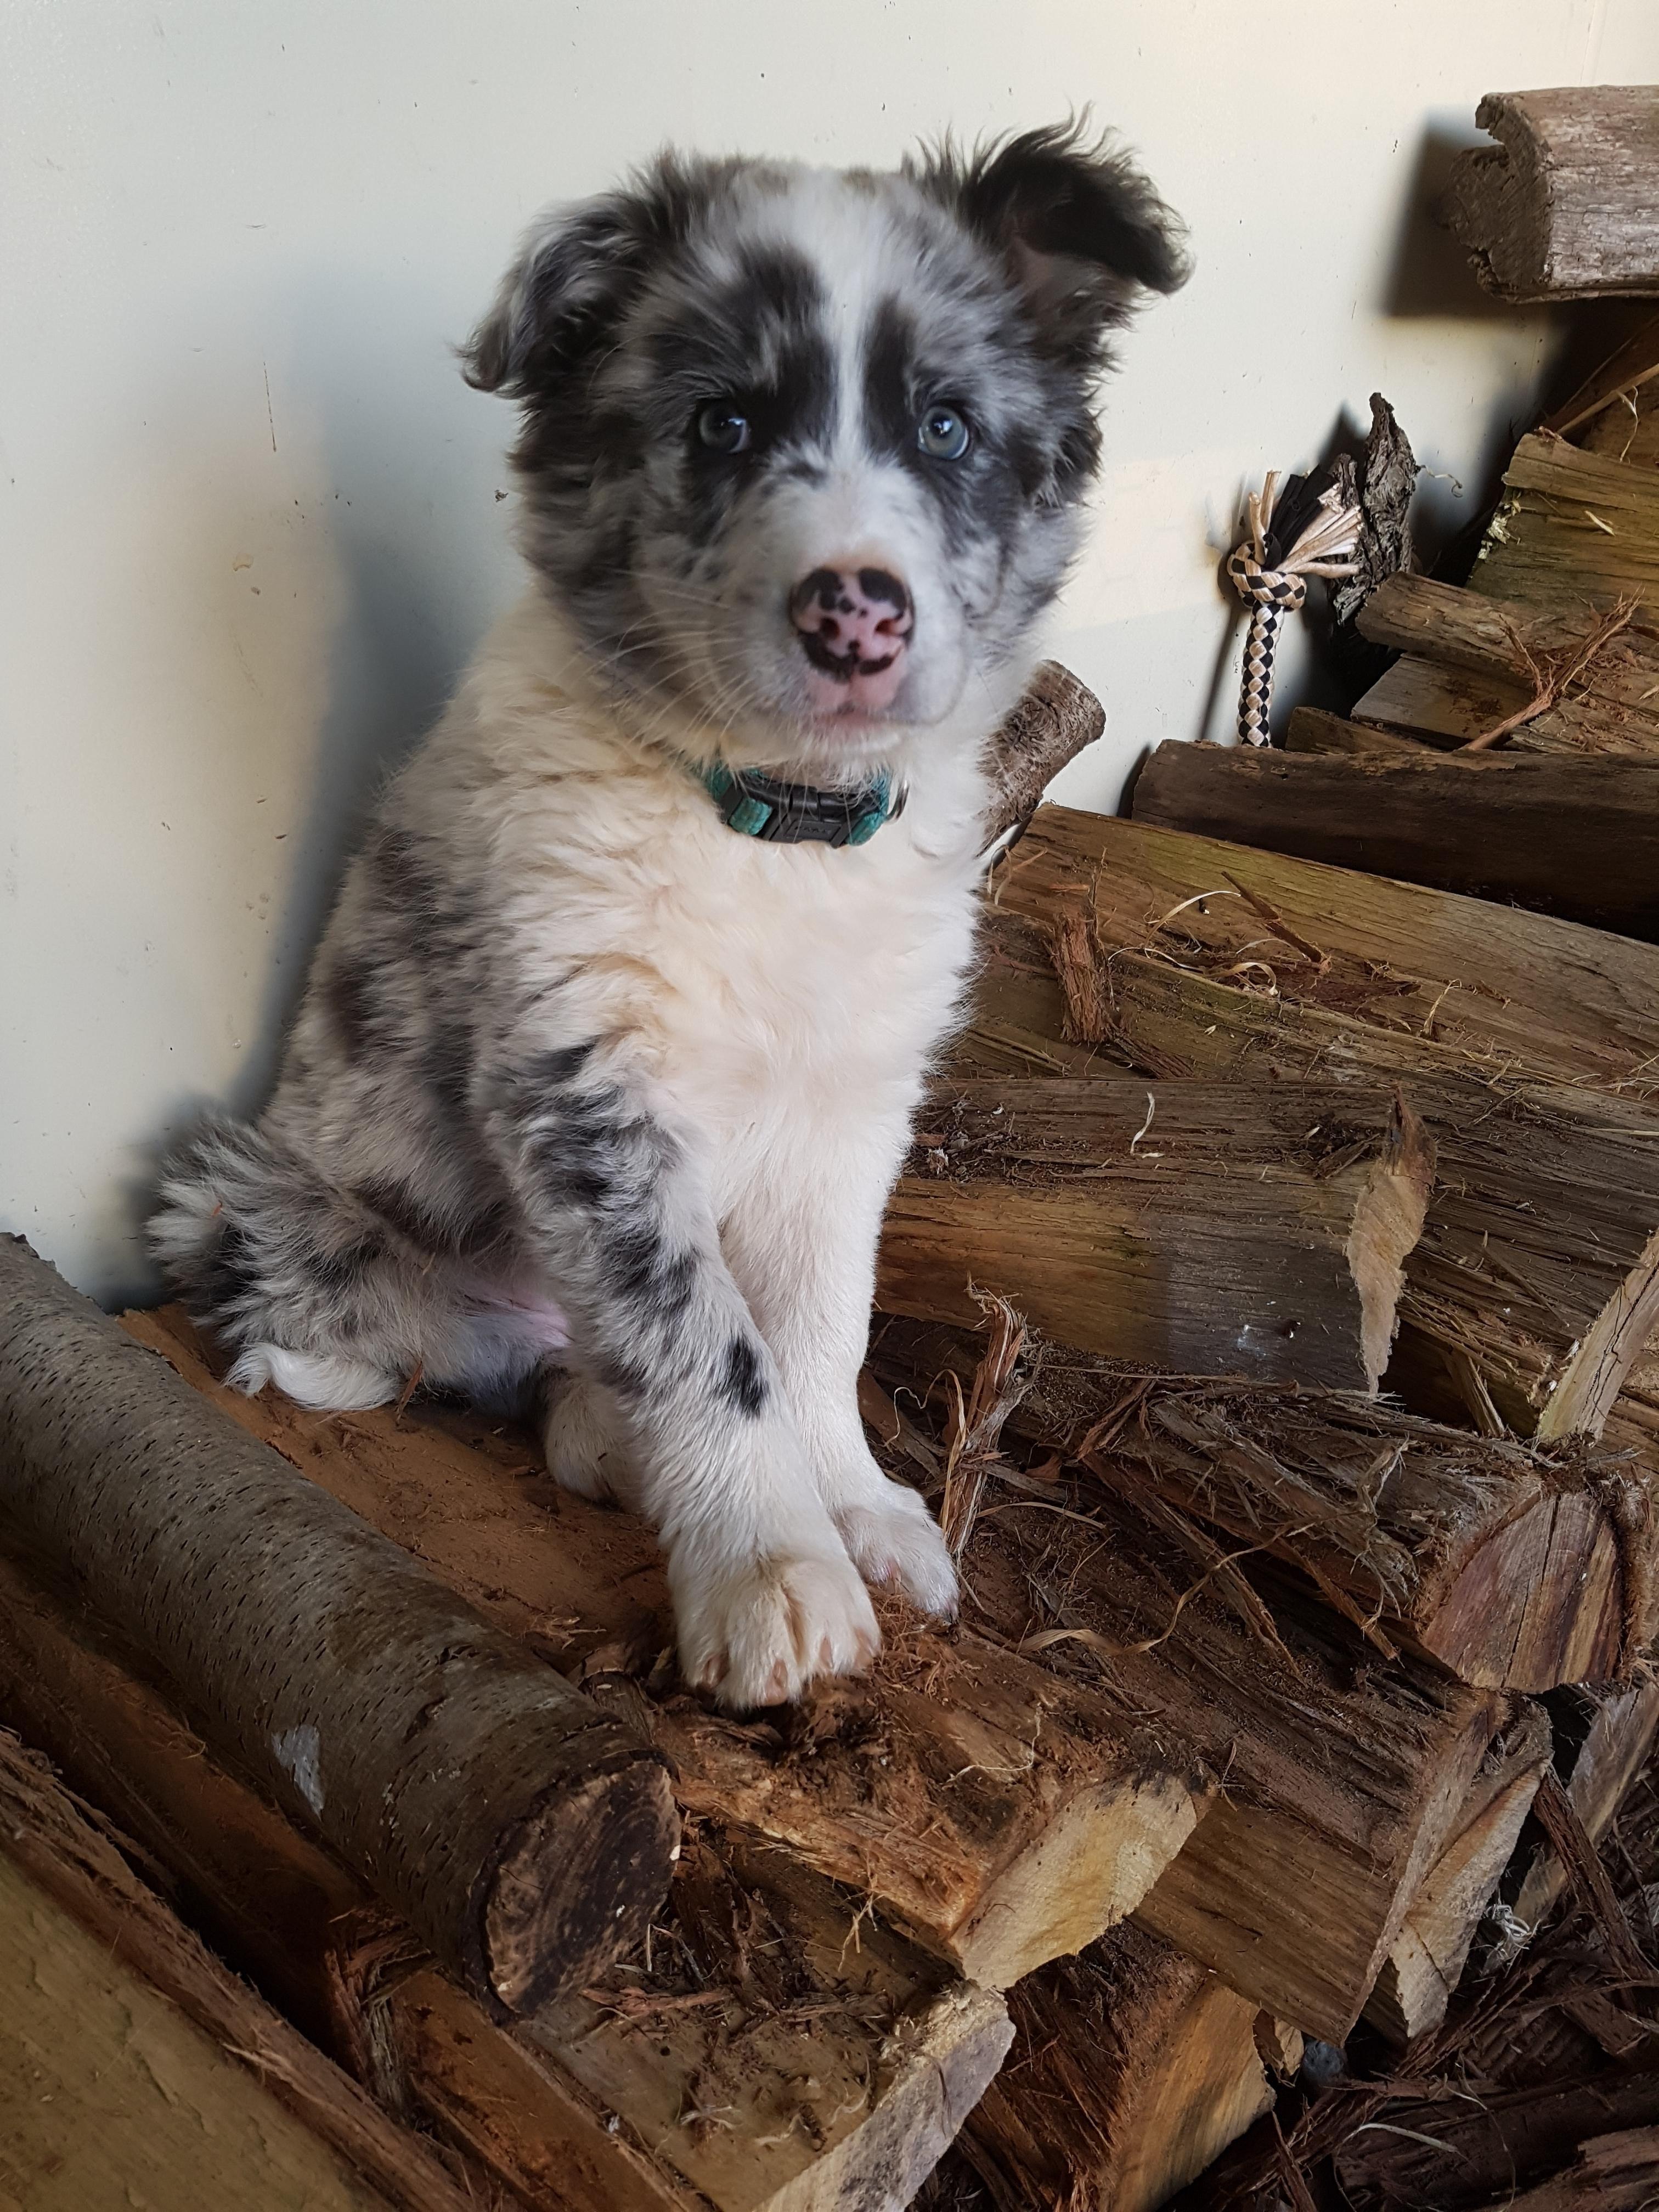 My Blue Merle Border Collie Pup Kip Http Ift Tt 2tdtpzp Border Collie Puppies Collie Puppies For Sale Border Collie